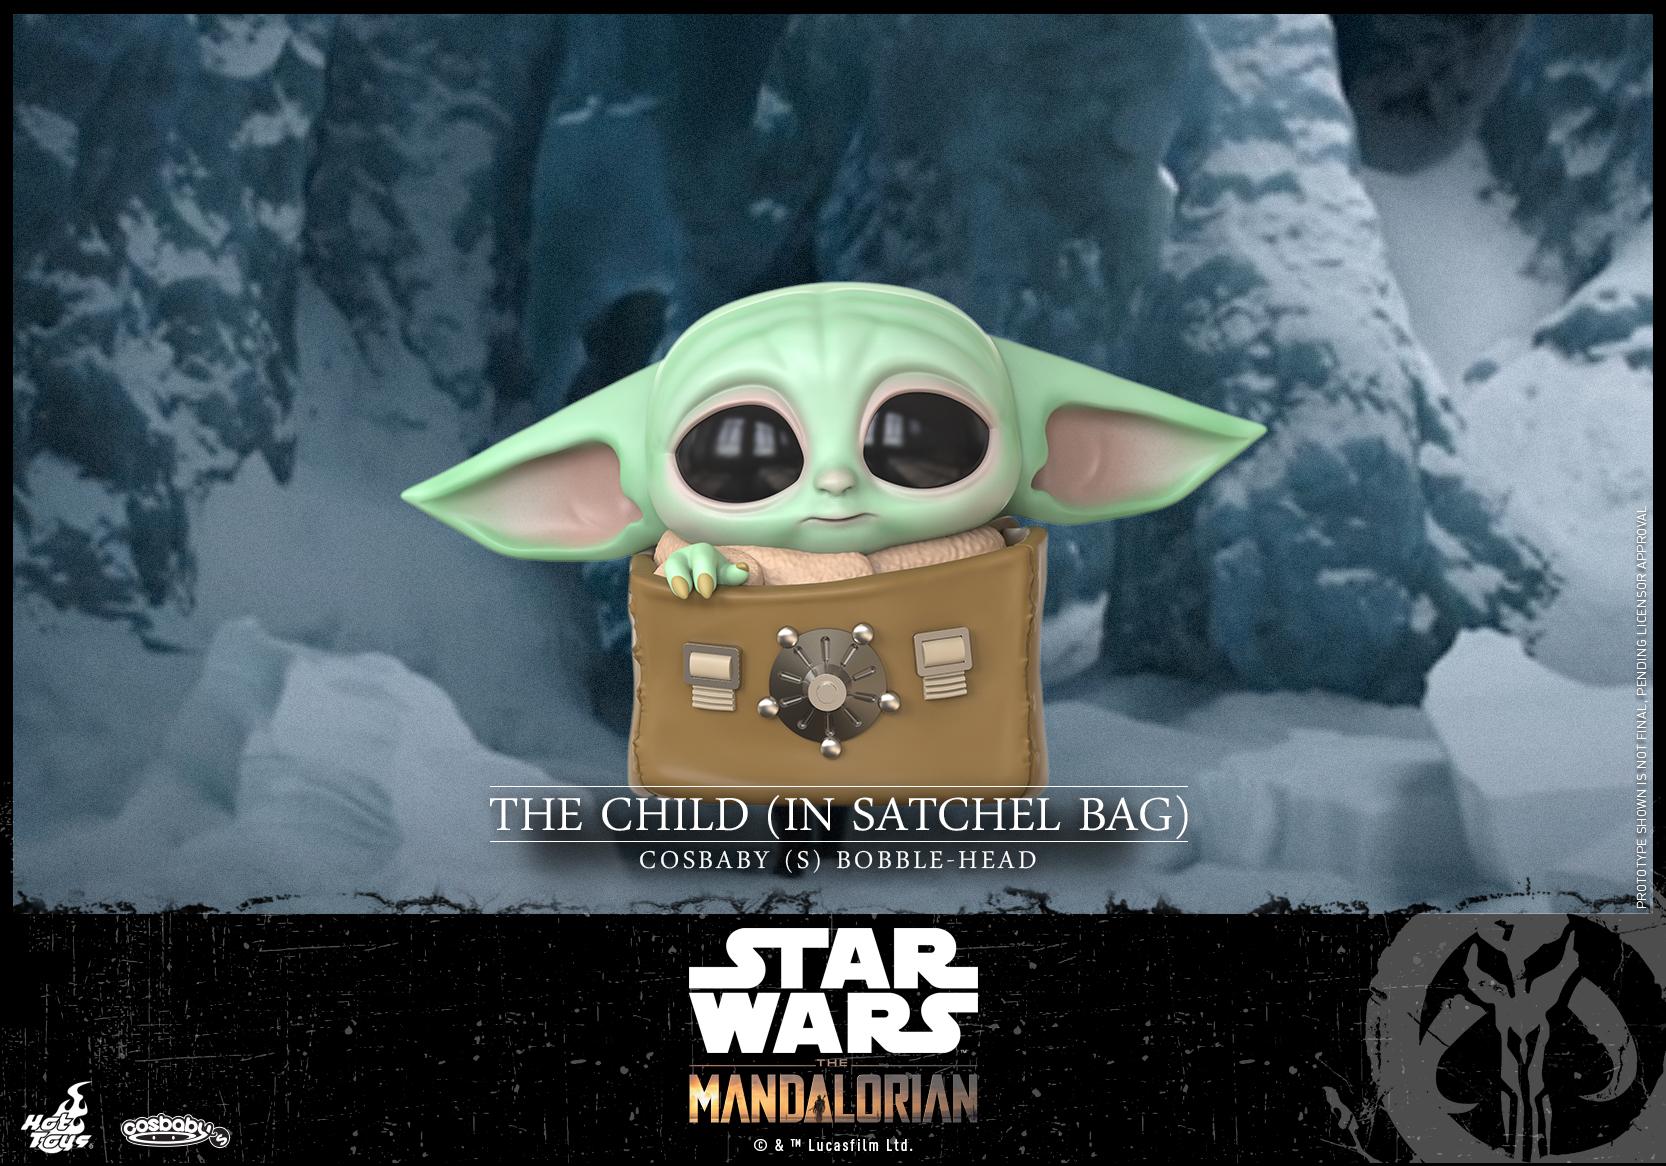 Hot Toys - Mandalorian II - The Child (In Satchel Bag) Cosbaby_PR1